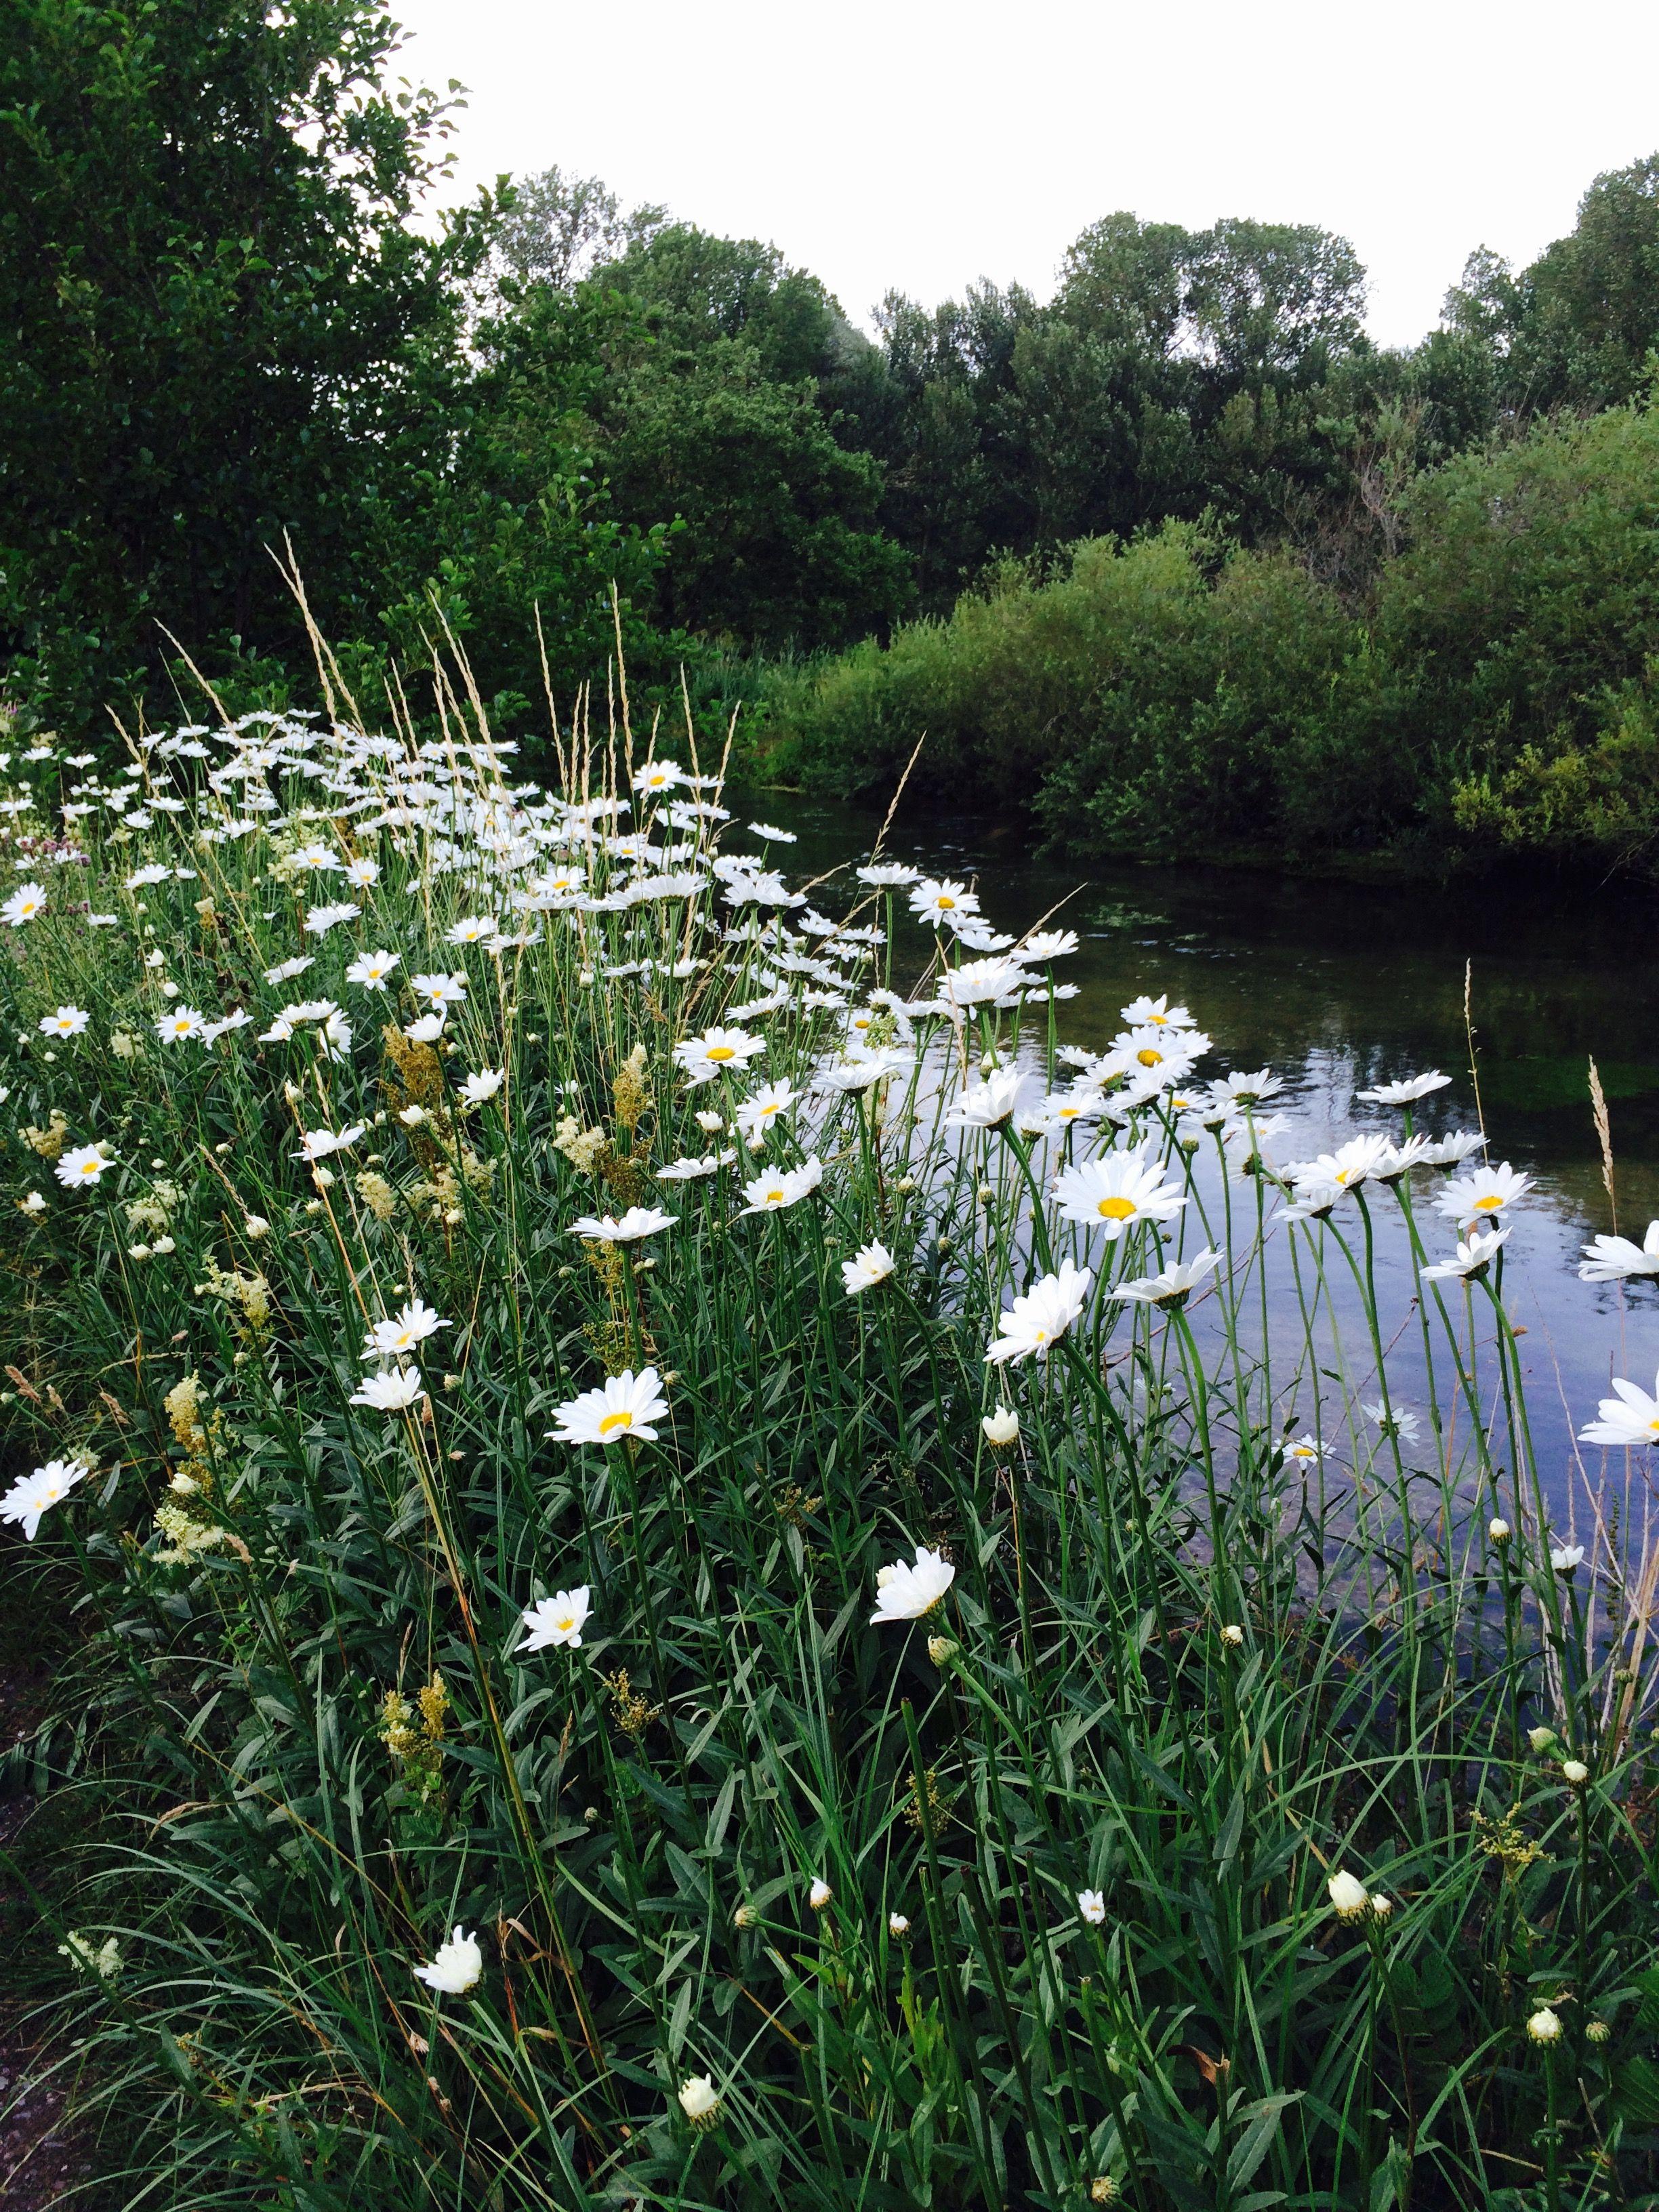 Whitchurch Hampshire | Hampshire, Explore